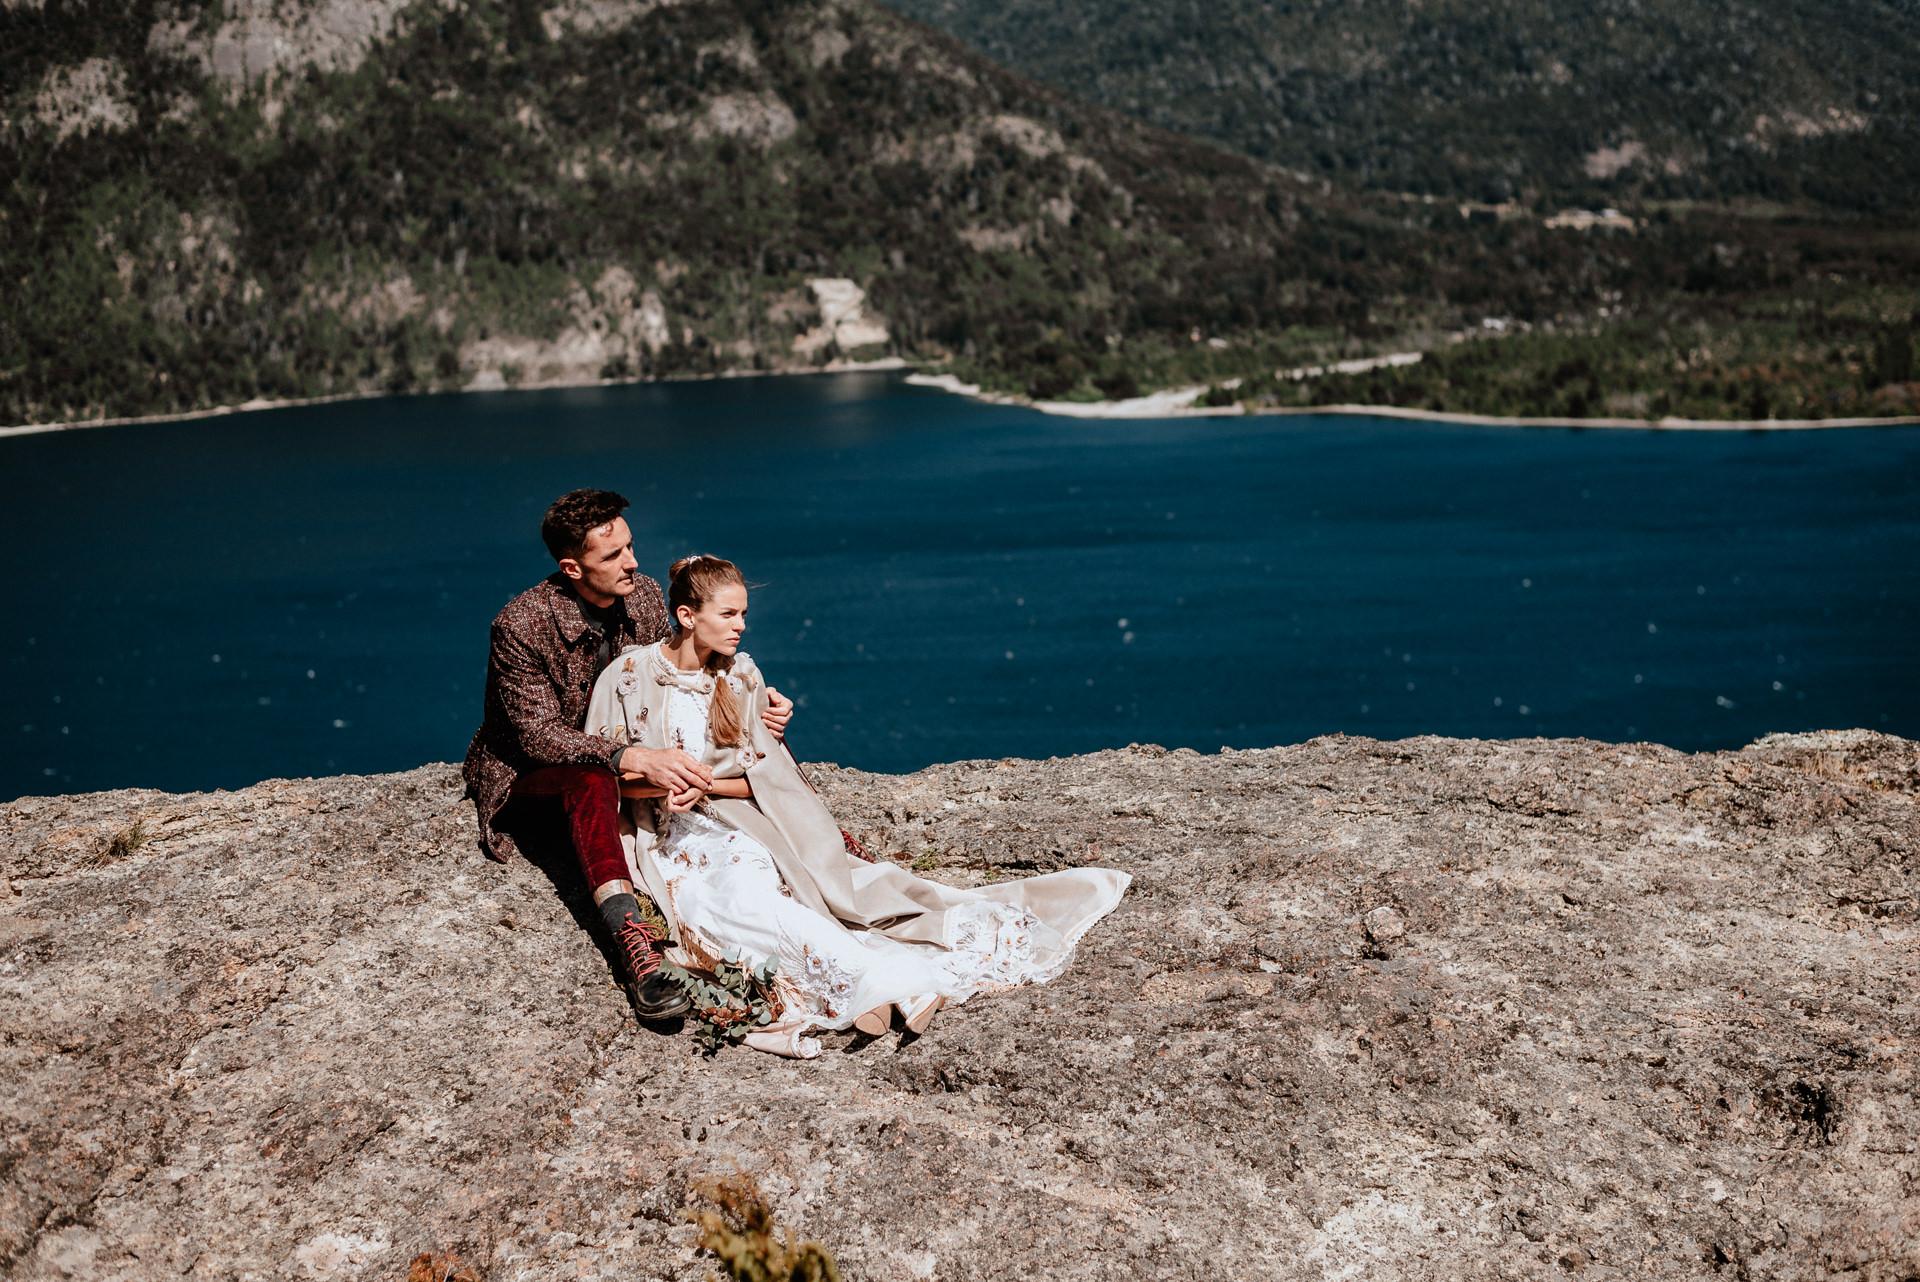 elopement wedding in the mountains bariloche